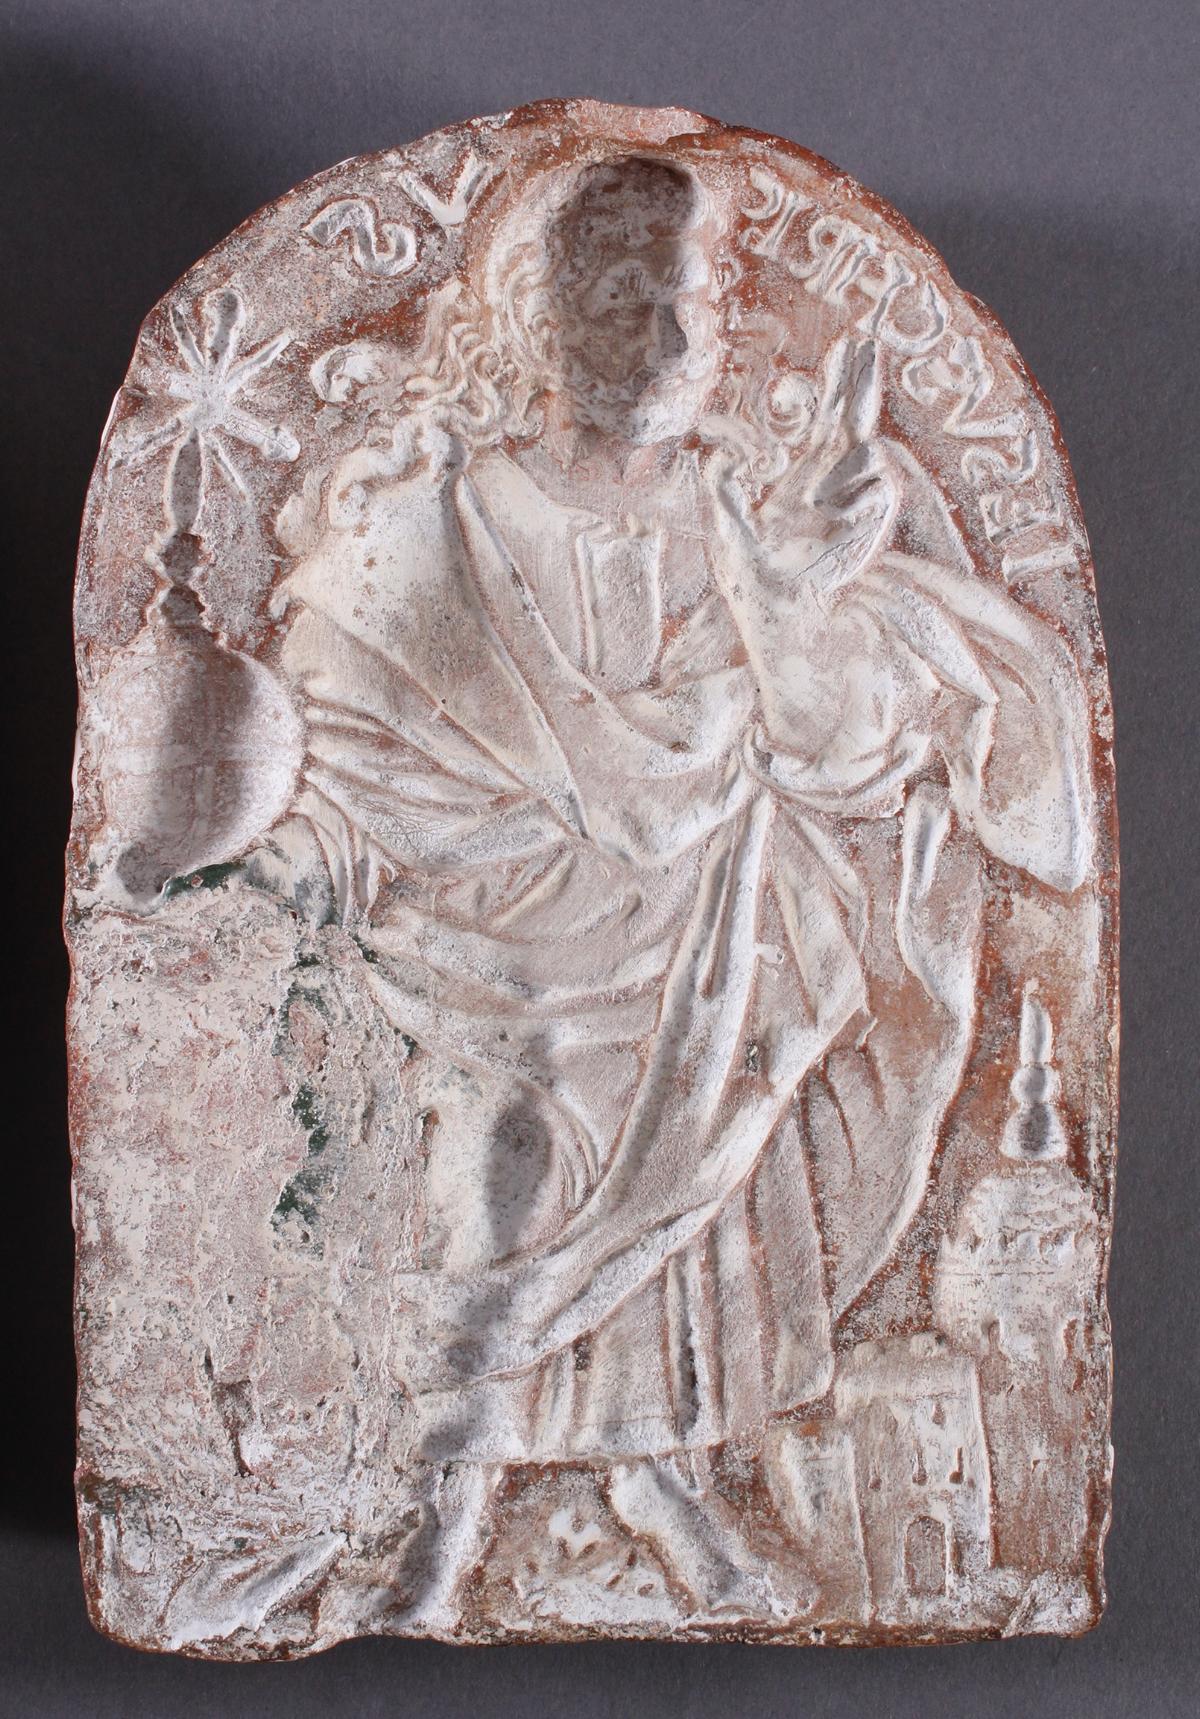 Religiöses, Terracotta und Gipstafel-4